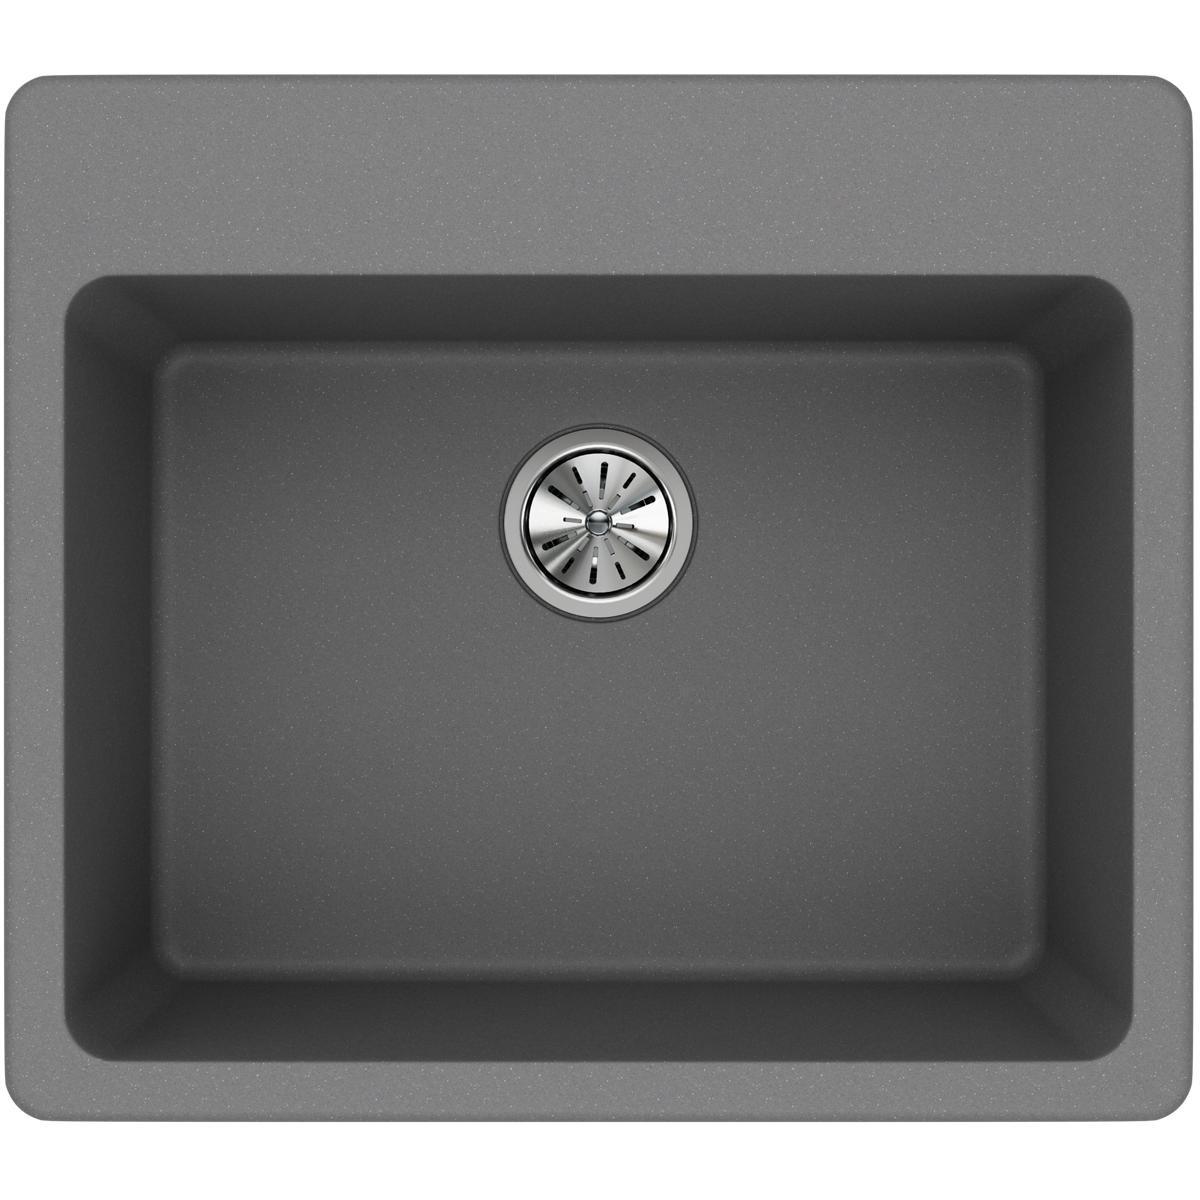 Elkay Quartz Classic ELG2522GS0 Greystone Single Bowl Top Mount Sink